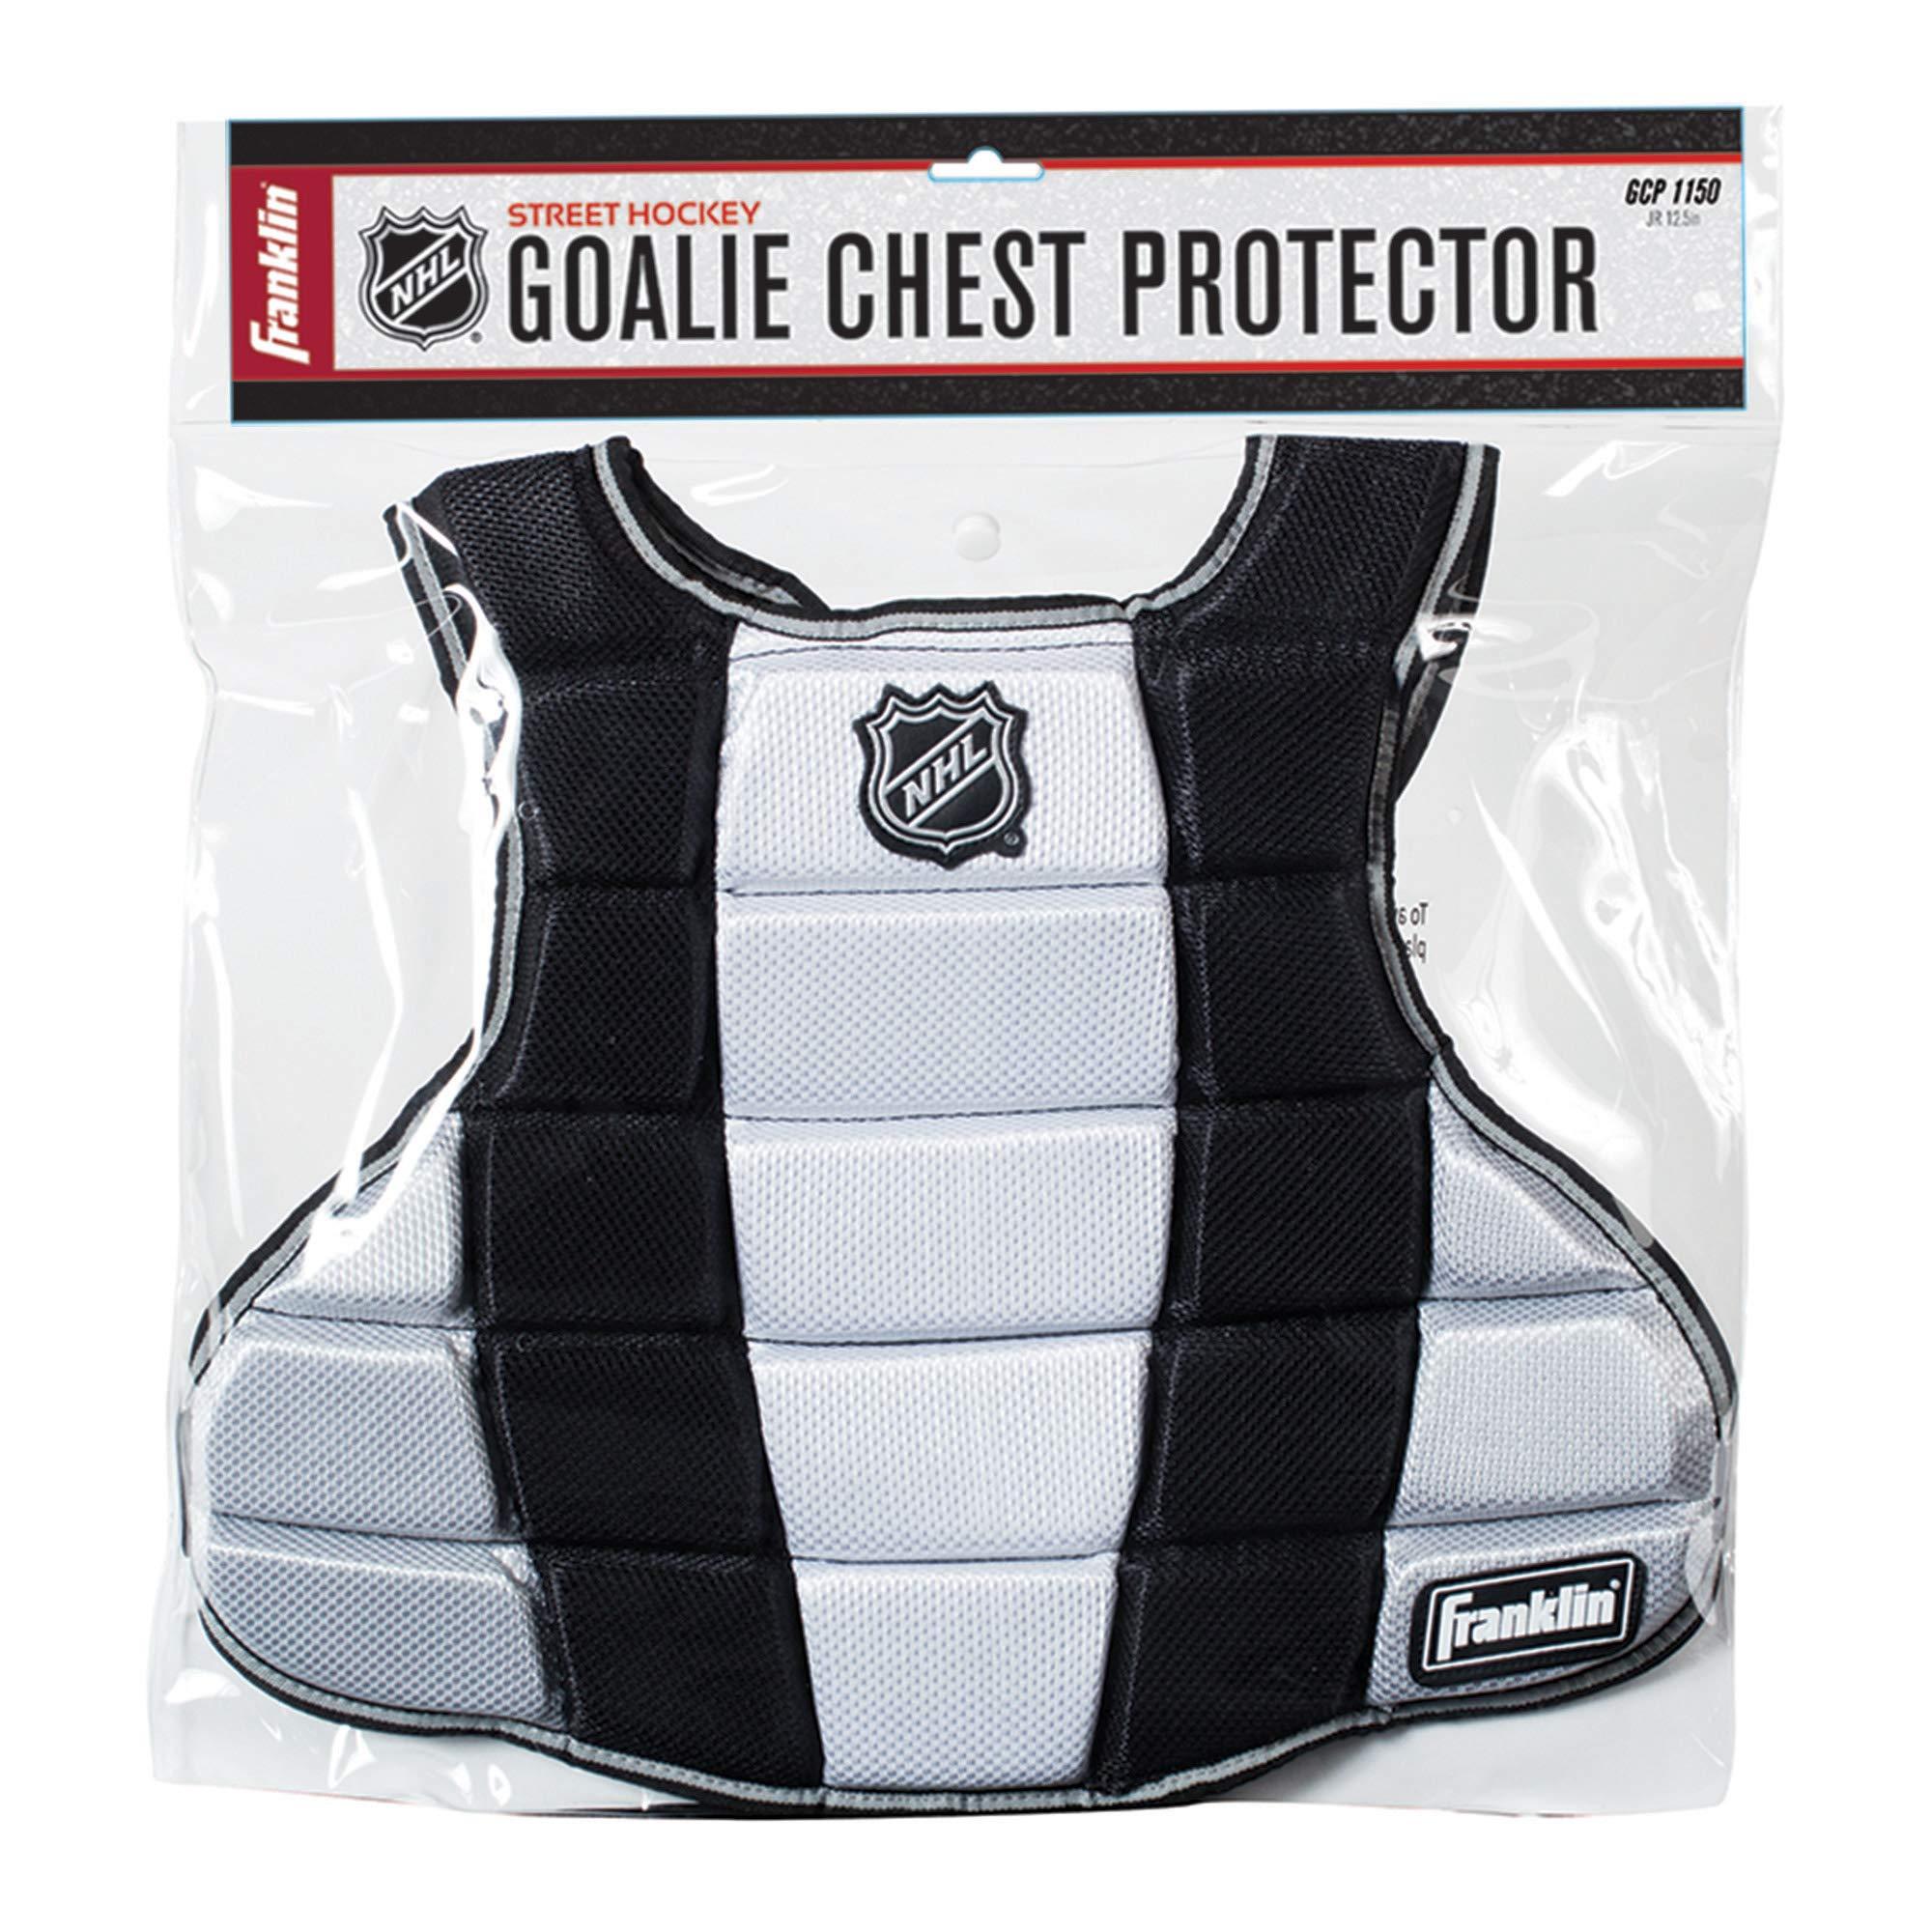 Franklin Sports NHL SX Pro GCP 1150 Goalie Chest